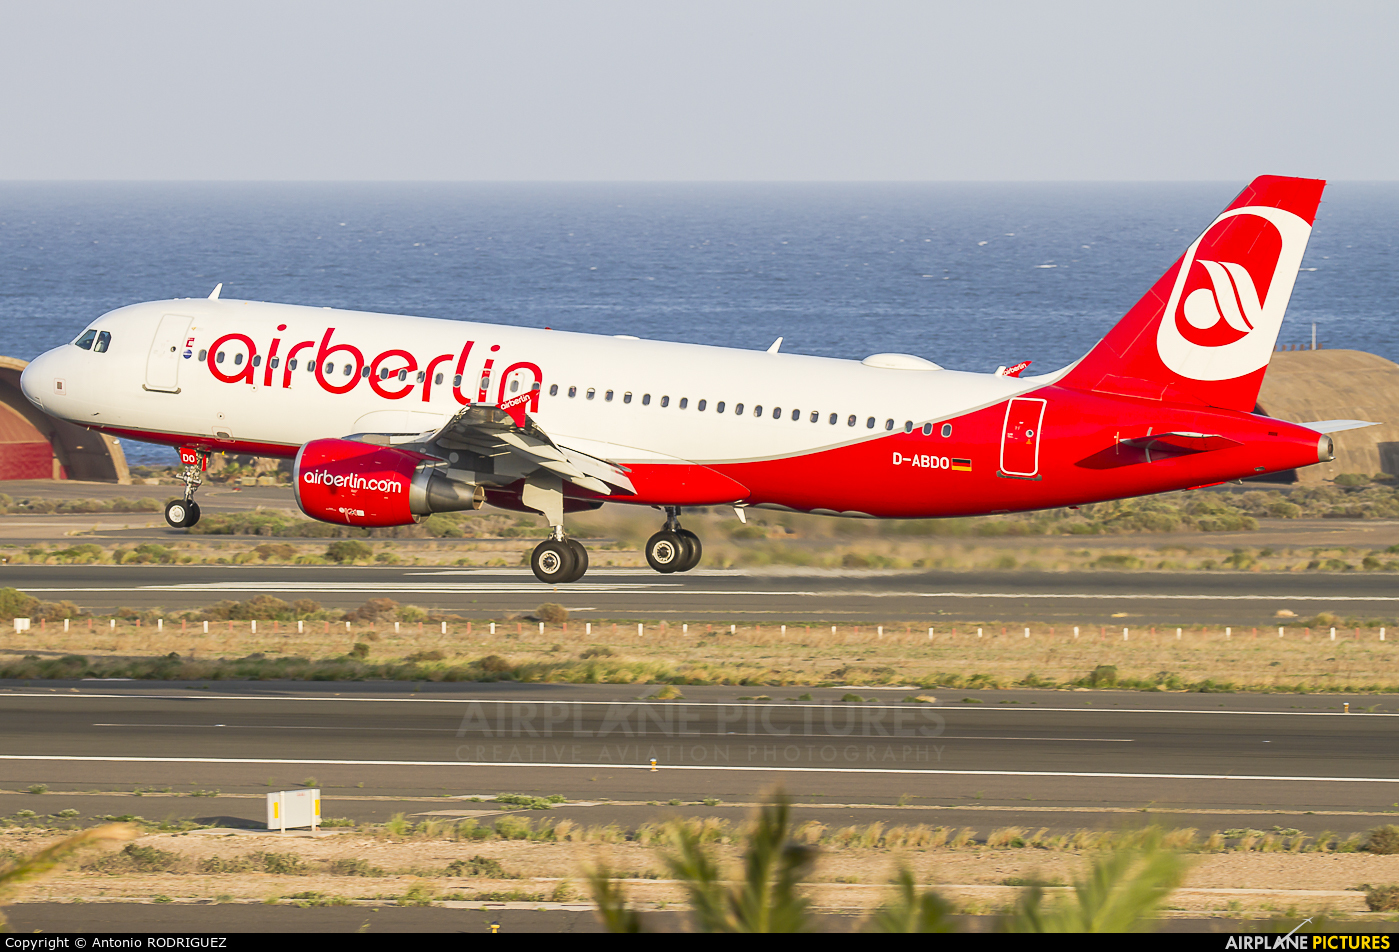 Air Berlin D-ABDO aircraft at Las Palmas de Gran Canaria